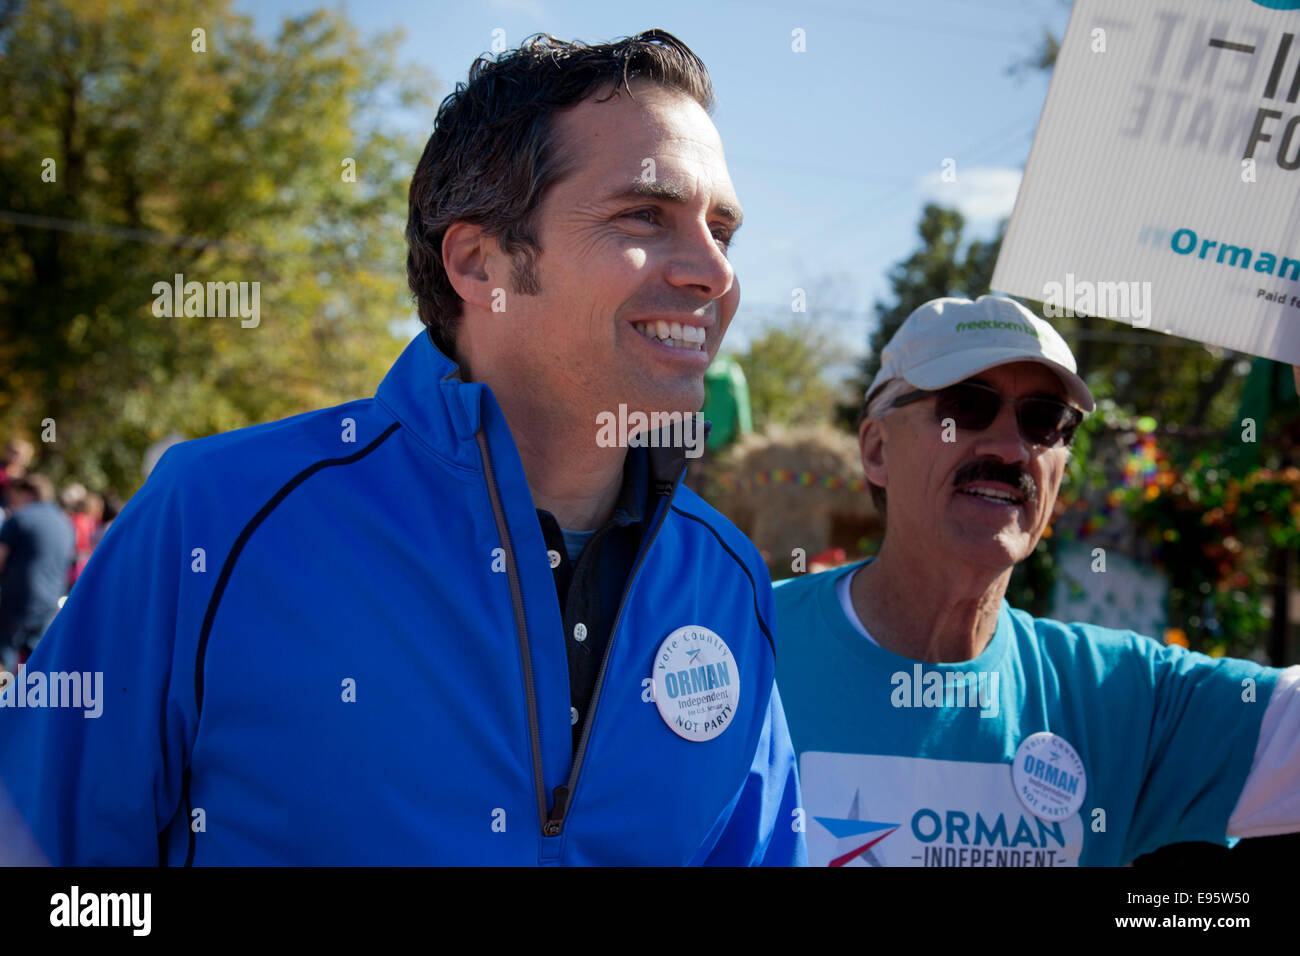 Baldwin City, Kansas, USA. 18th October, 2014. Kansas Independent candidate for United States Senate, entrepreneur - Stock Image